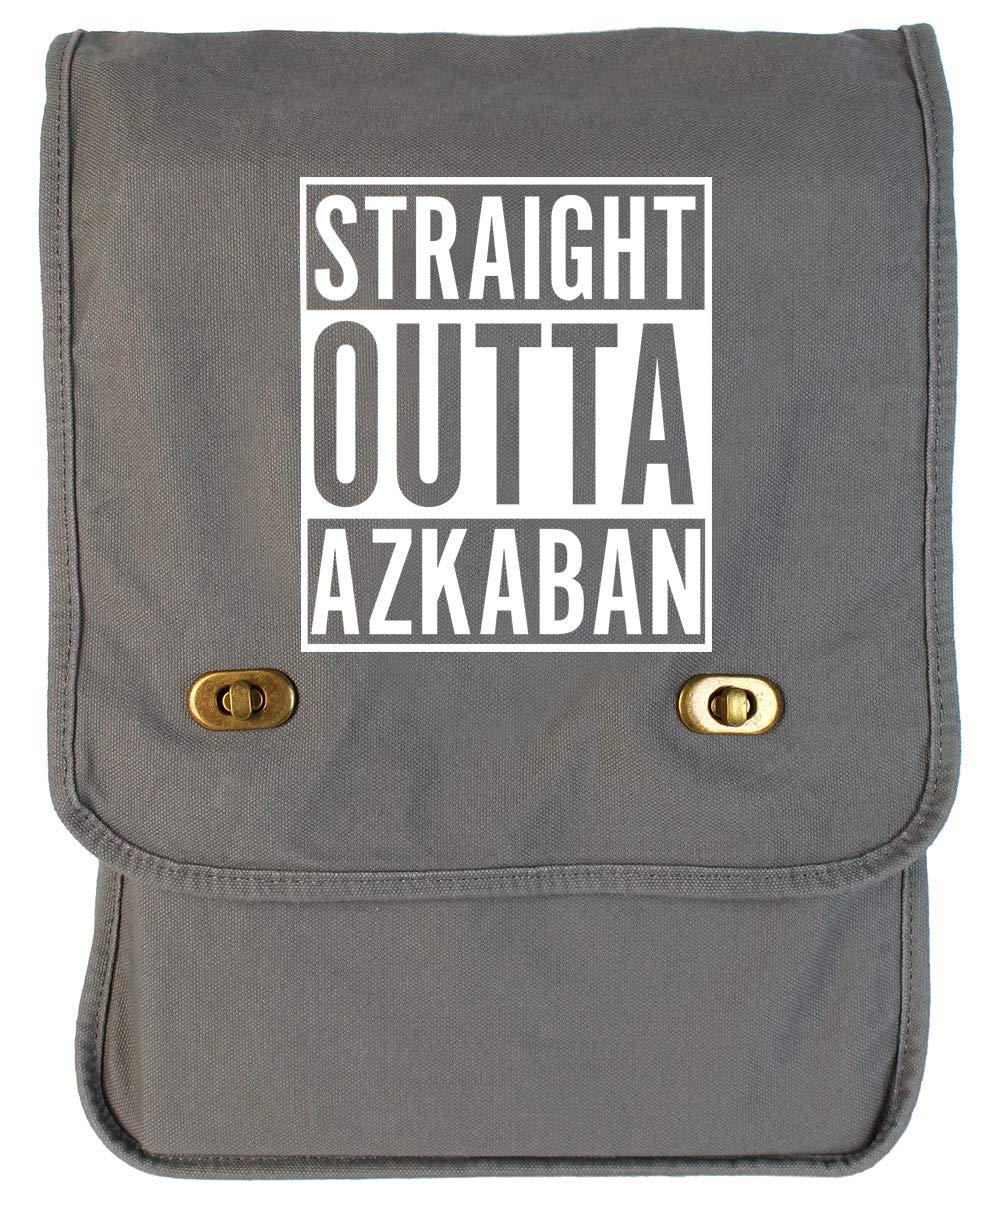 Tenacitee Straight Outta Azkaban Grey Brushed Canvas Messenger Bag